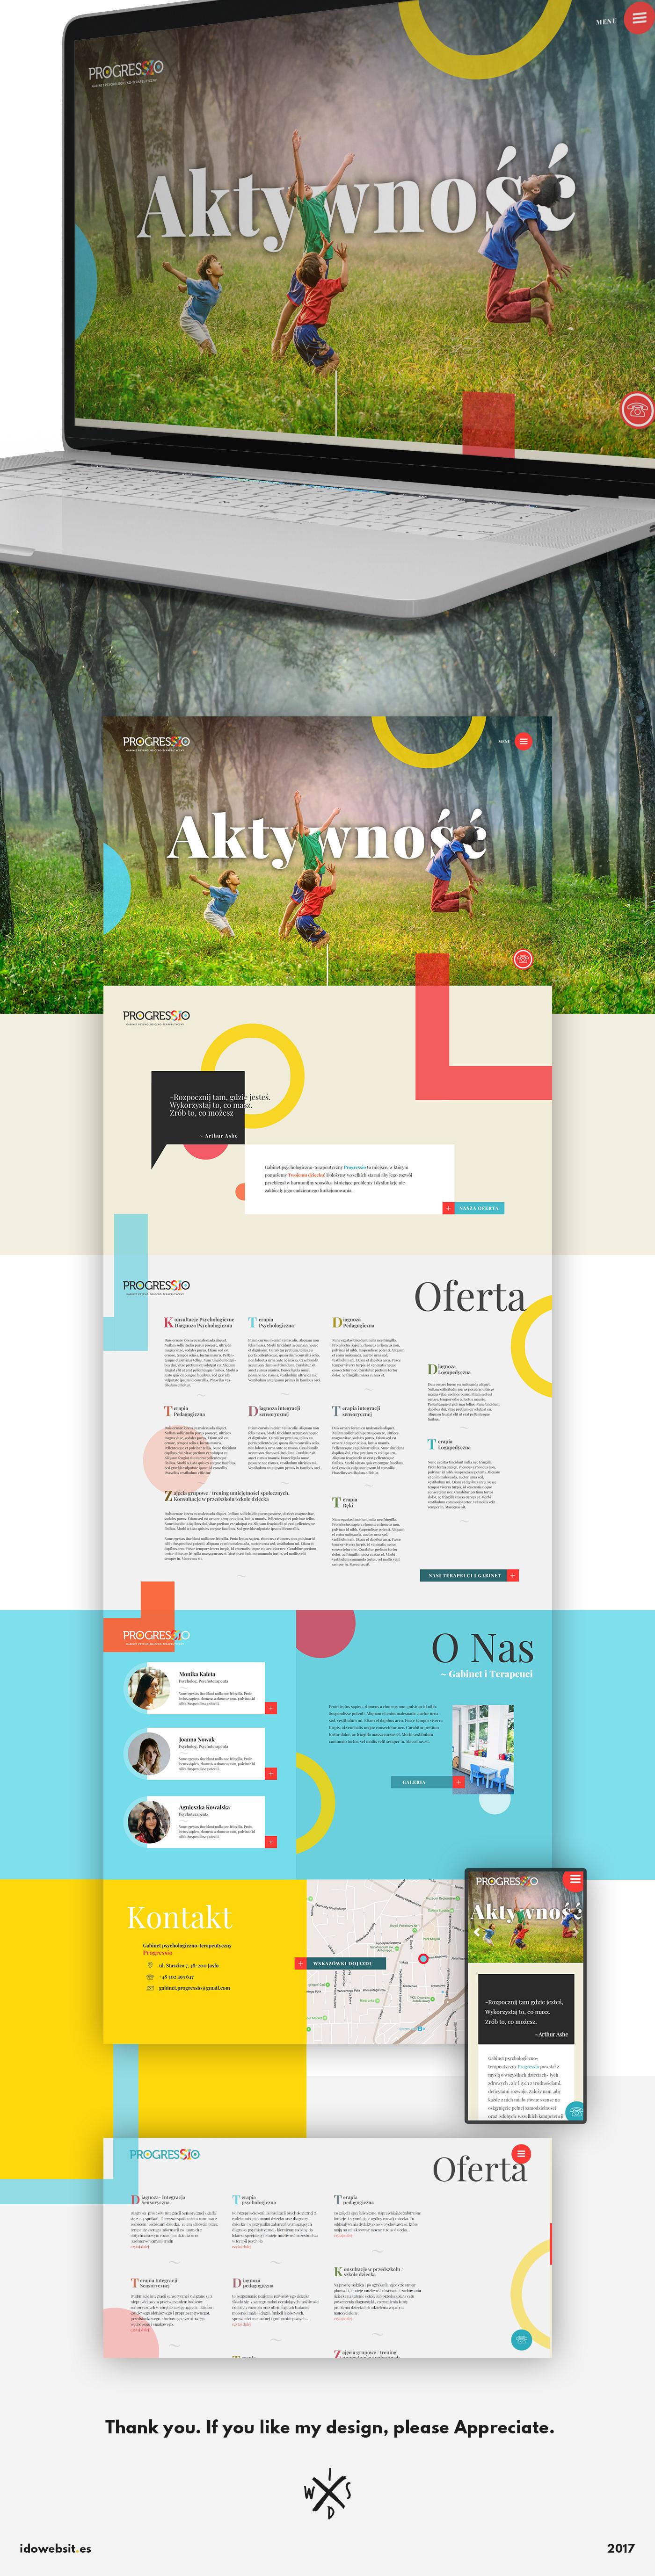 colorful colors kids Layout Design Theme Design UI ui design Web Design  website layout wordpress theme